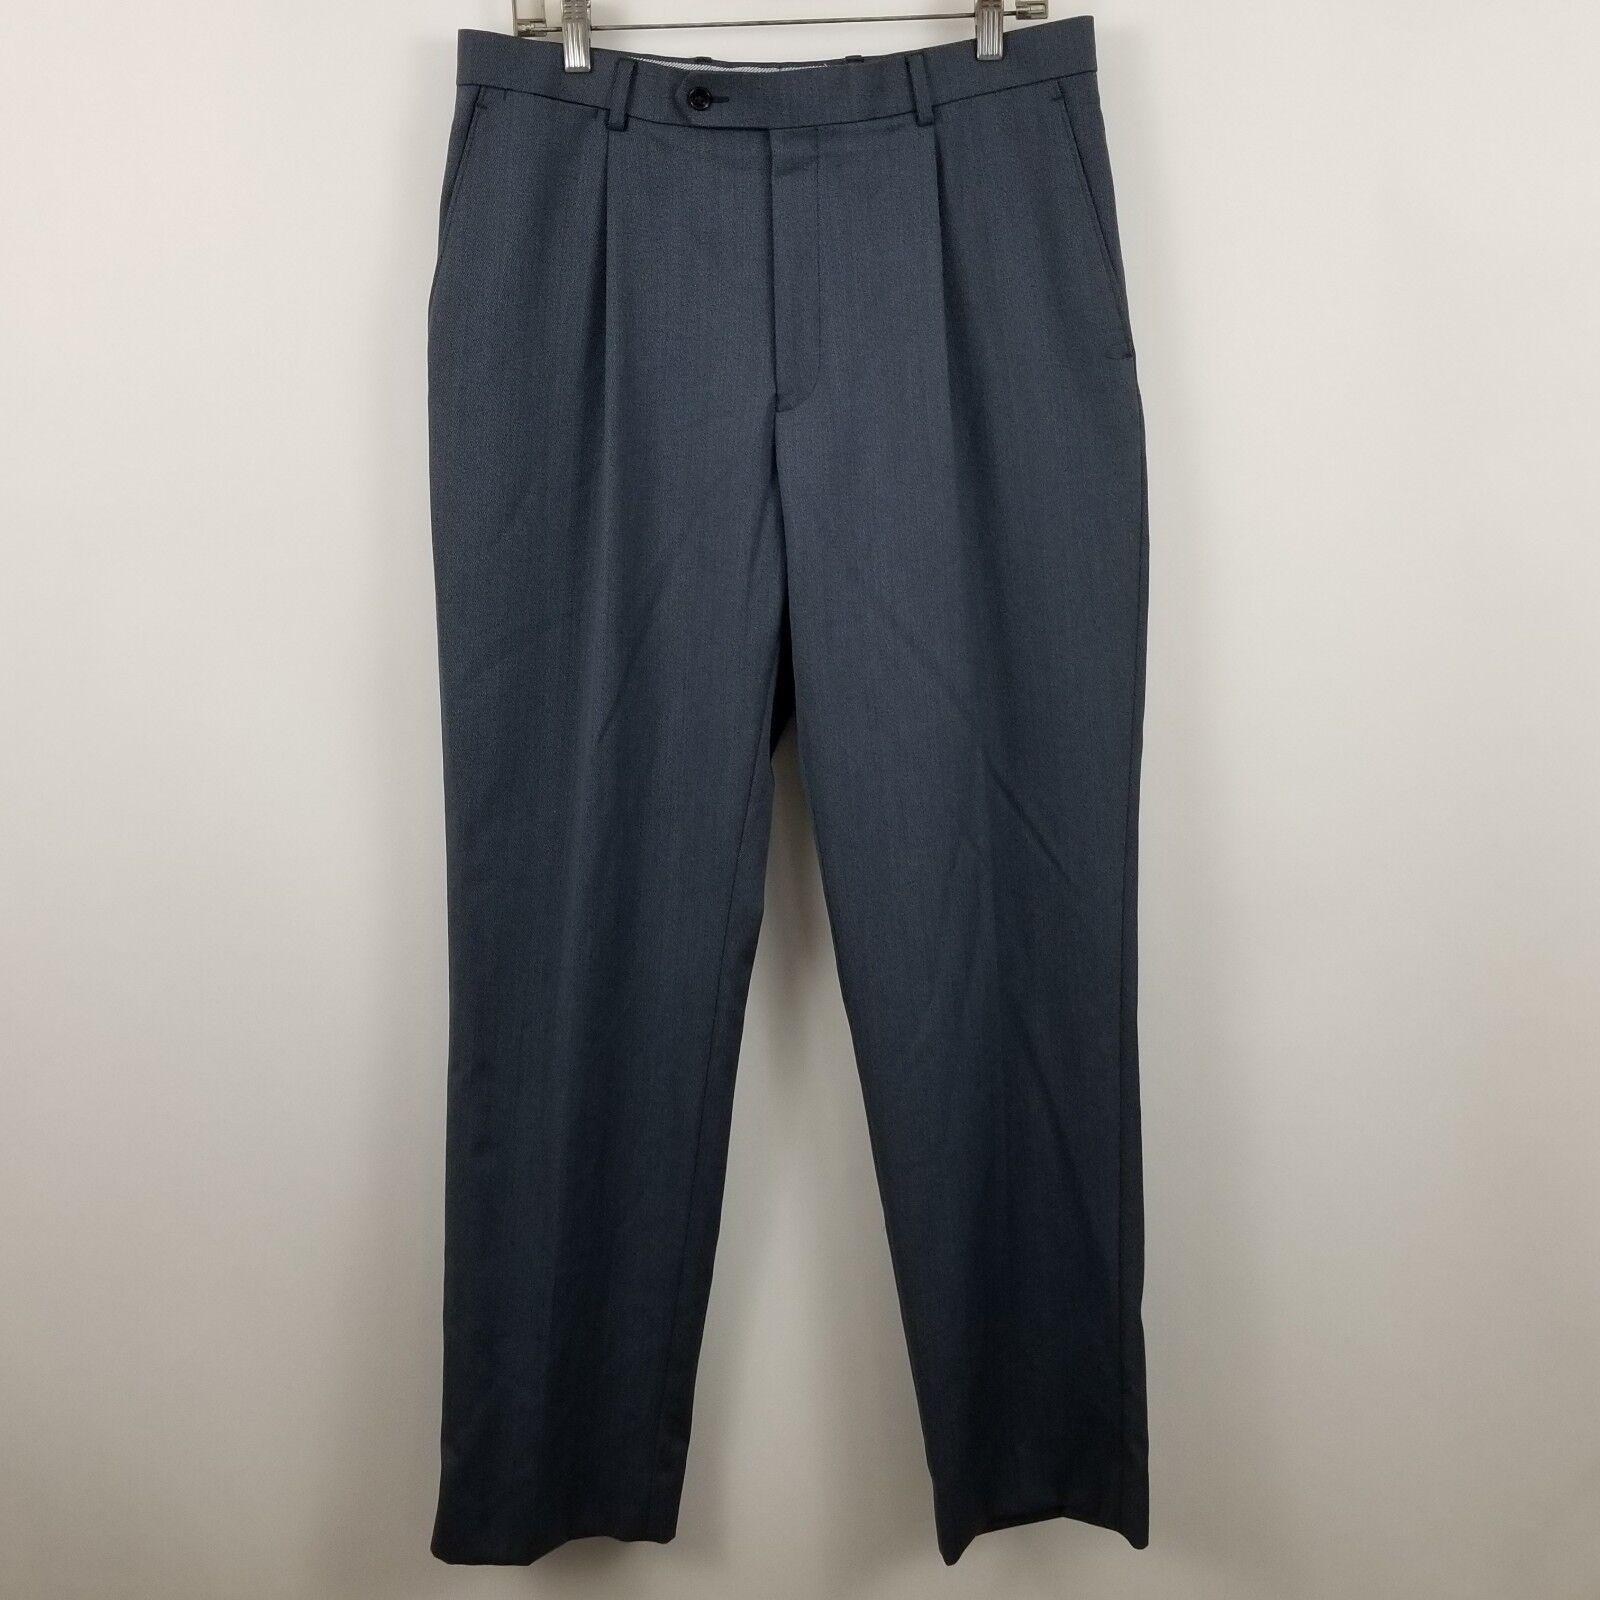 Hart Schaffner Marx Men's bluee Pleated Dress Pants Size 33R - 33x33